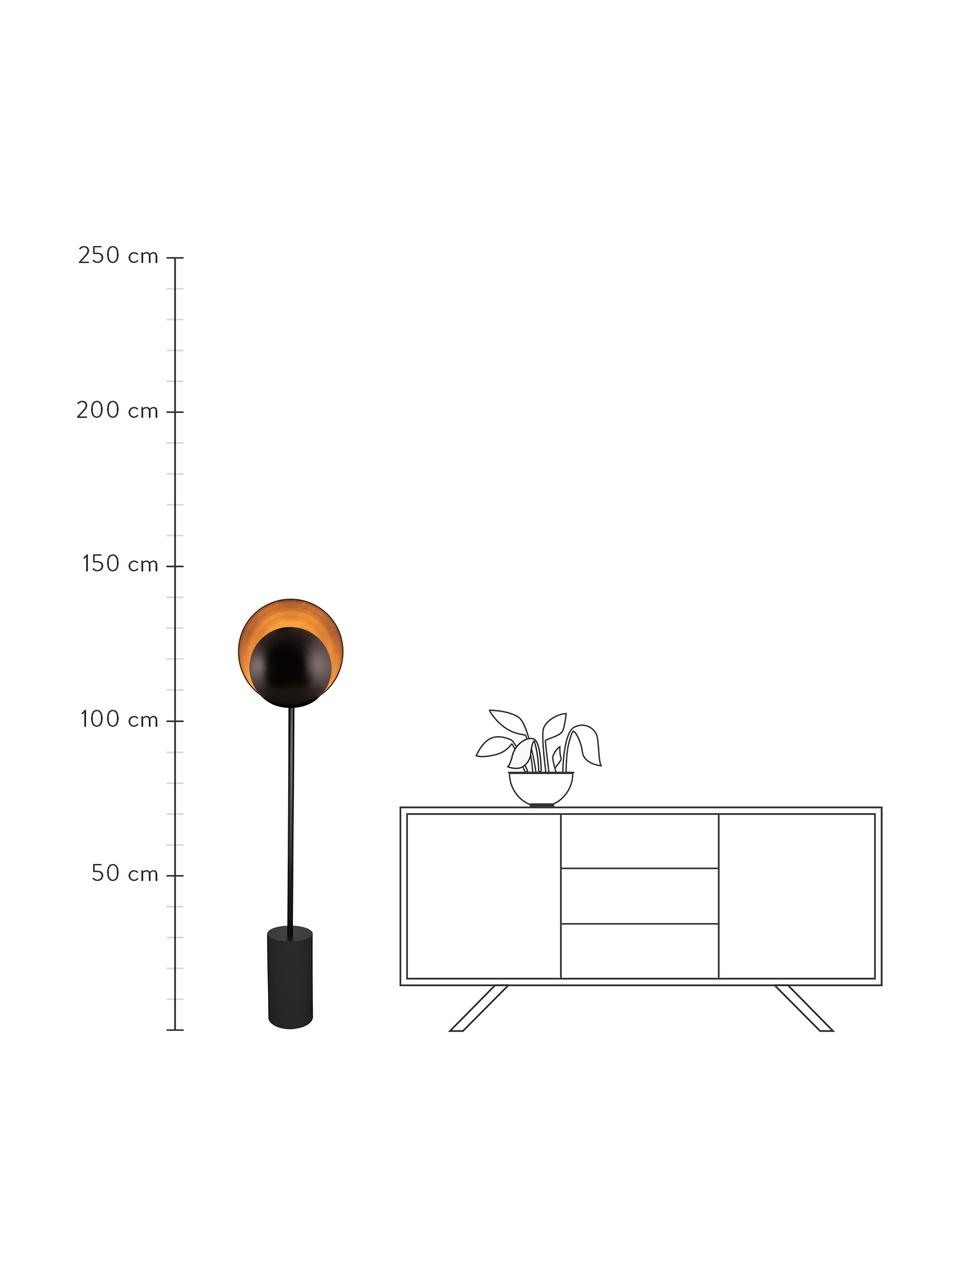 Lampada da terra nera Orbit, Paralume: metallo rivestito, Base della lampada: metallo rivestito, Nero, Larg. 30 x Alt. 140 cm